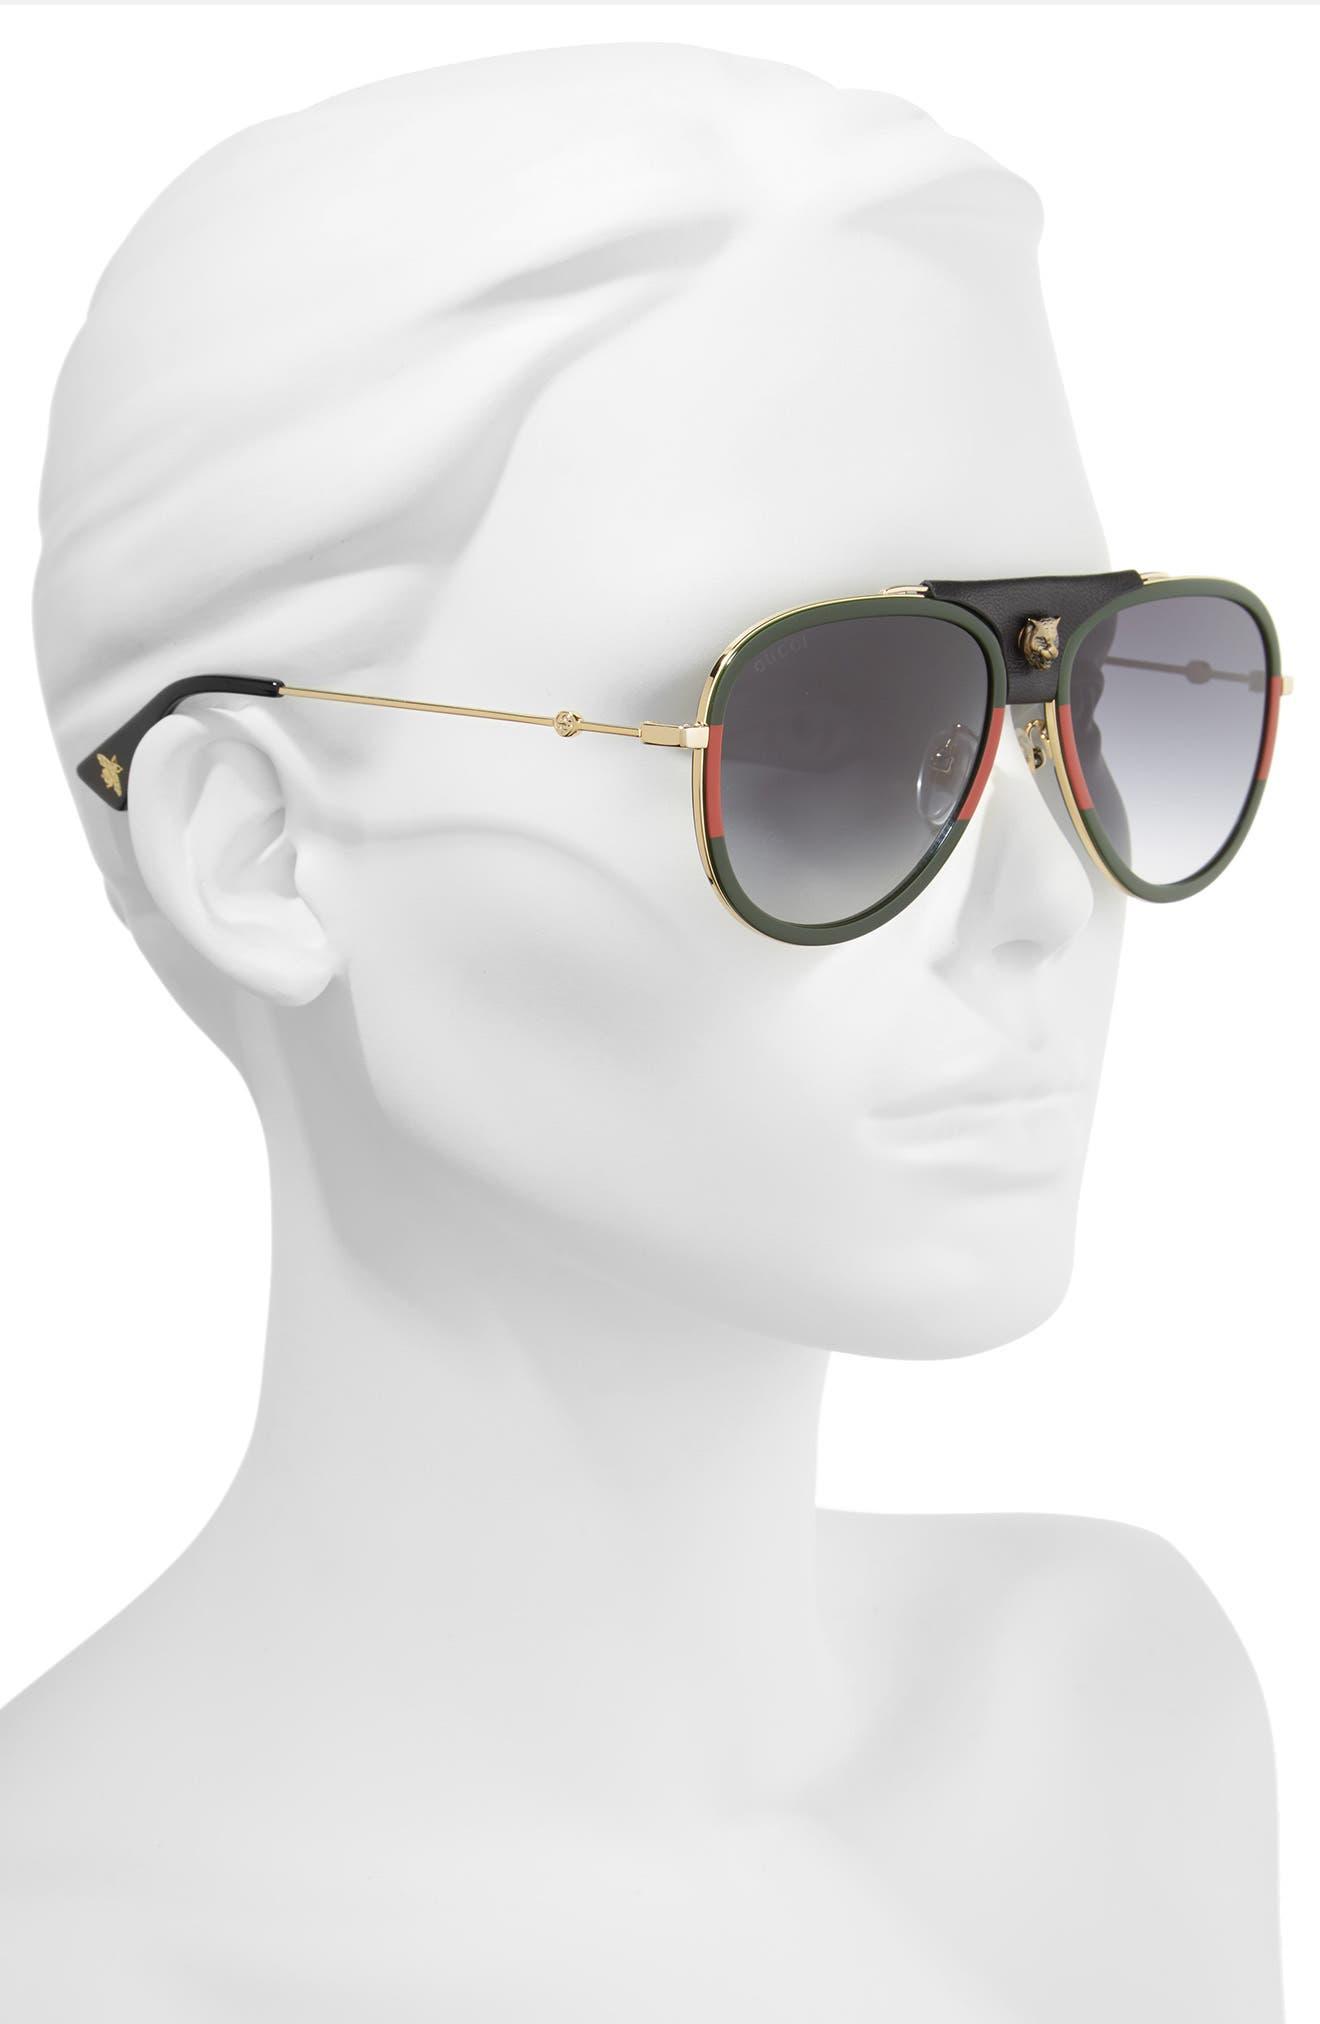 57mm Metal Aviator Sunglasses,                             Alternate thumbnail 2, color,                             GOLD